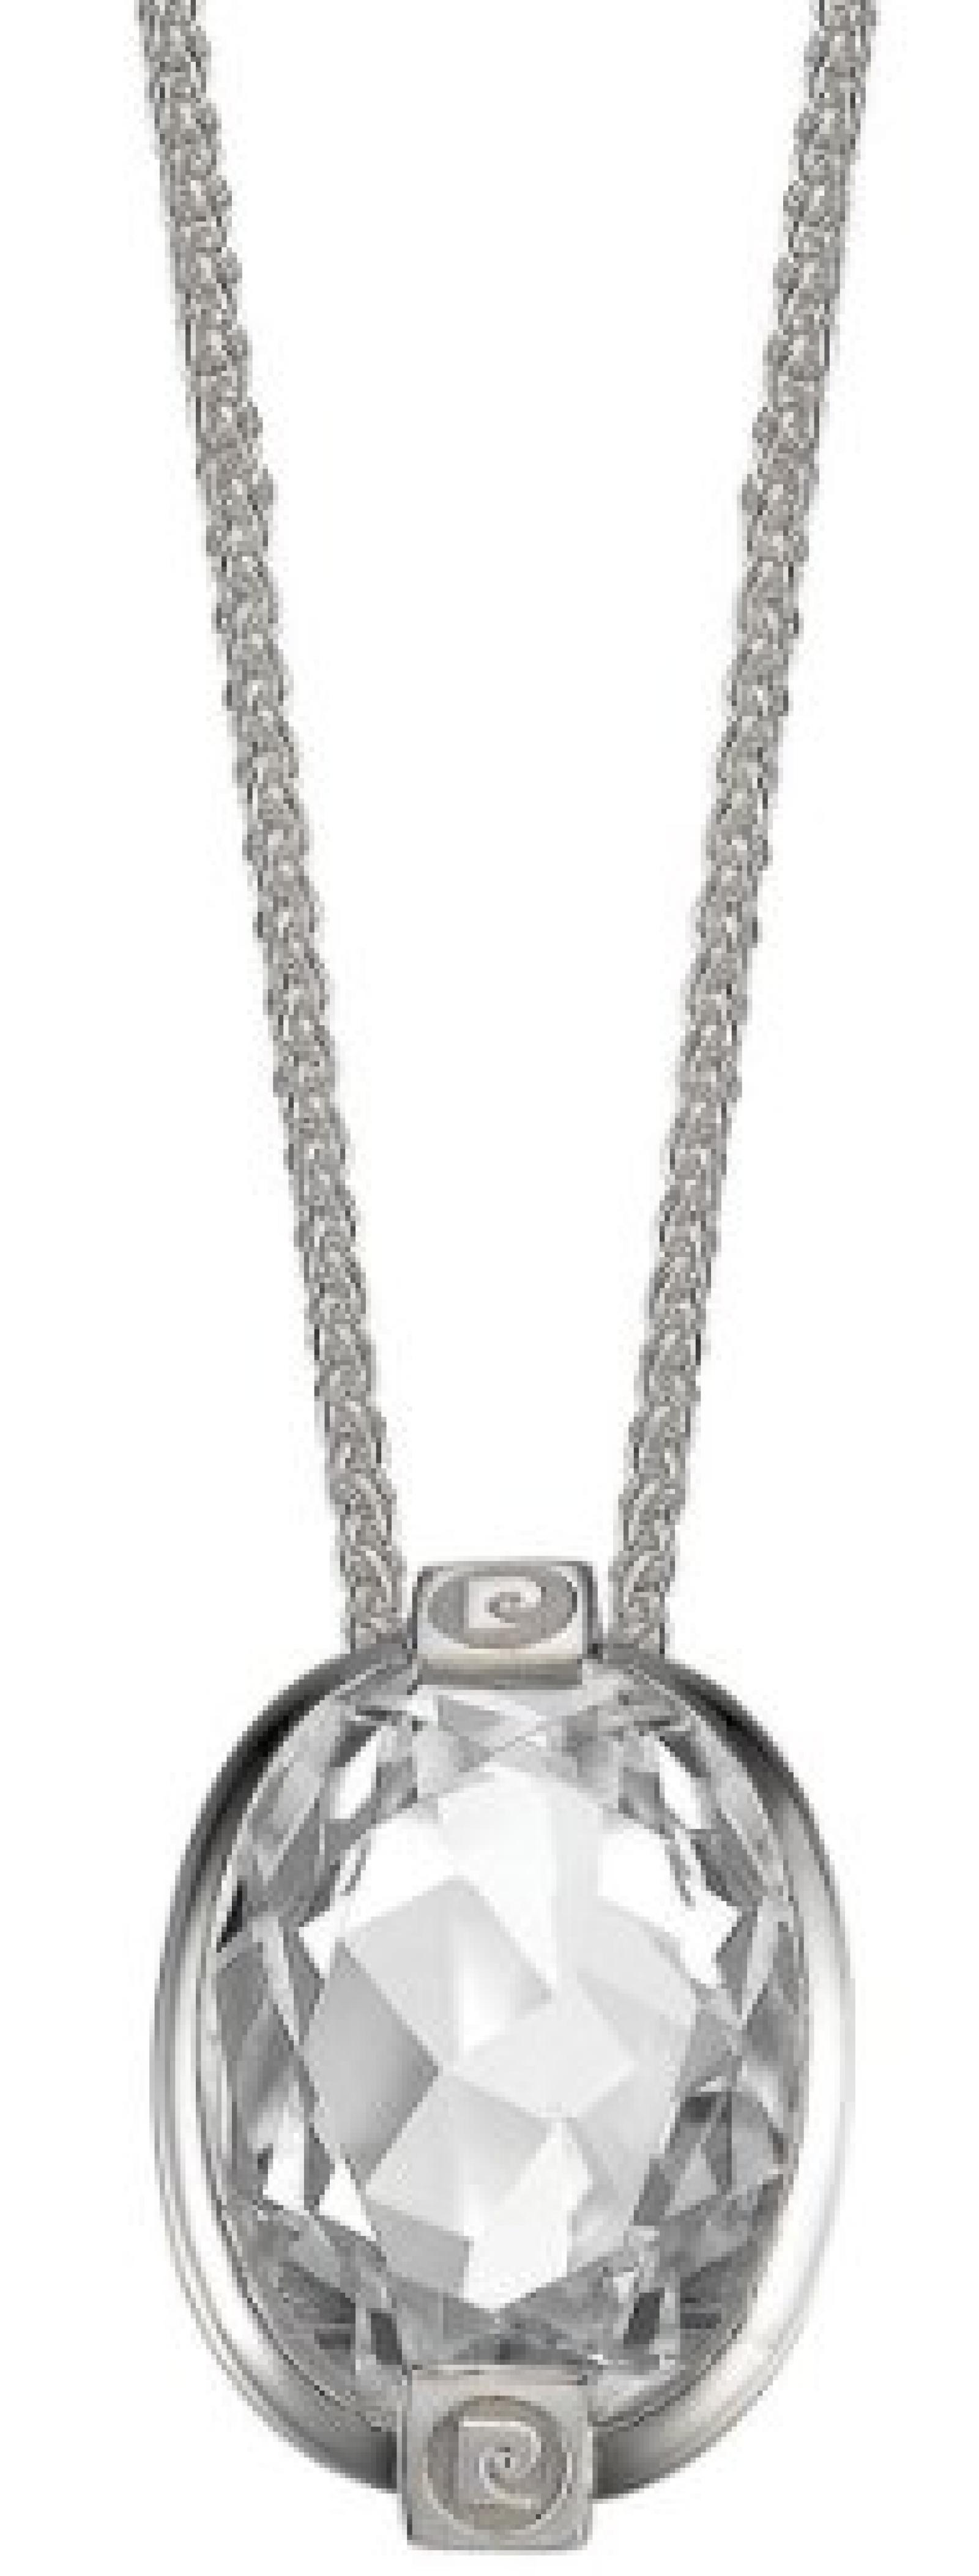 Pierre Cardin Damen Halskette 925 Sterling Silber rhodiniert Kristall Zirkonia Pierre précieuse 42 cm weiß PCNL90379A420